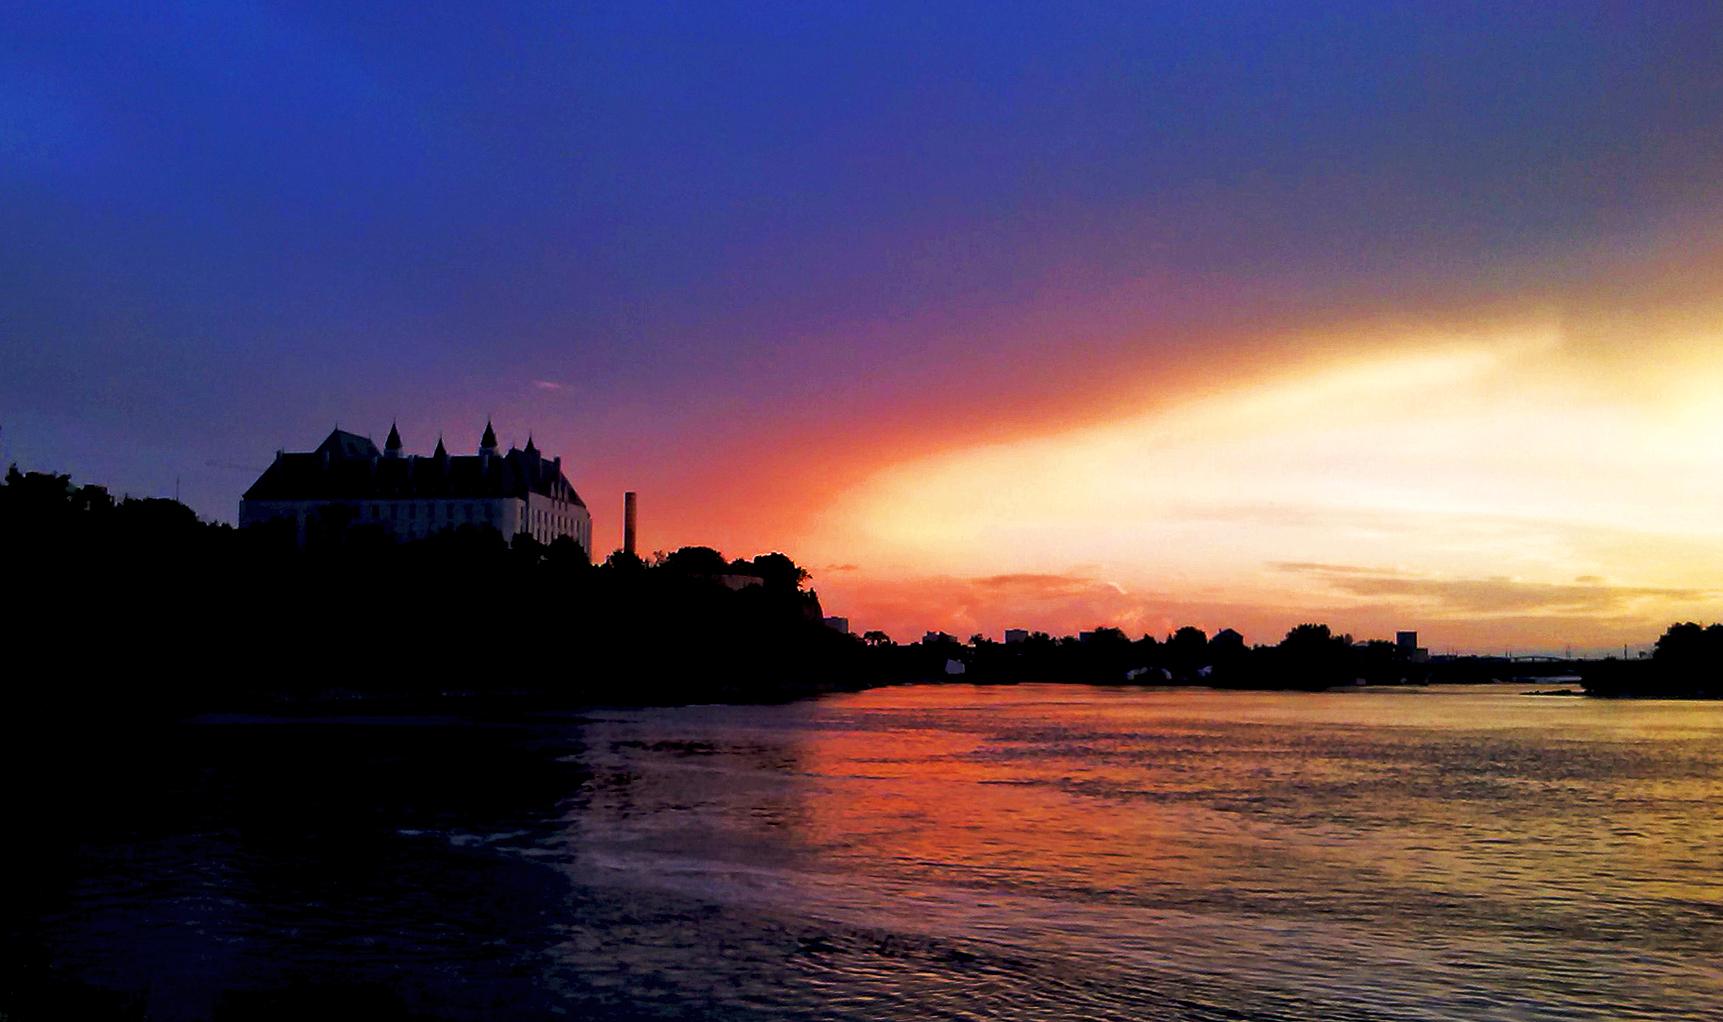 SUNSET OVER THE OTTAWA RIVER (2)